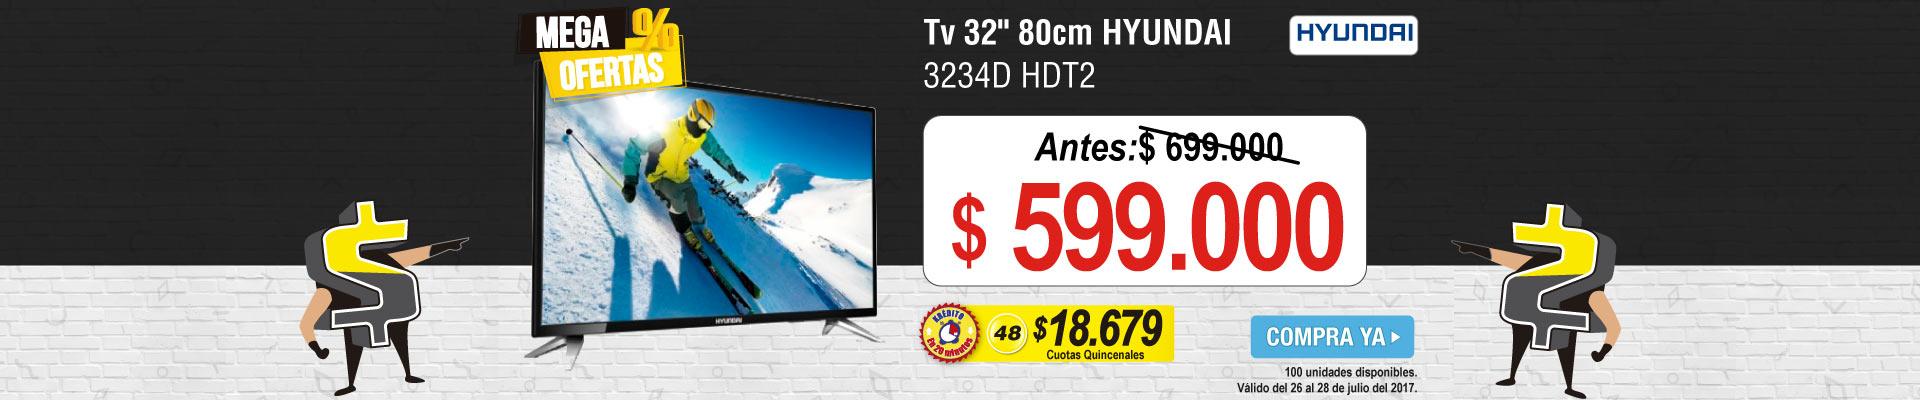 Tv 32 80cm HYUNDAI 3234D HDT2 - banner principal